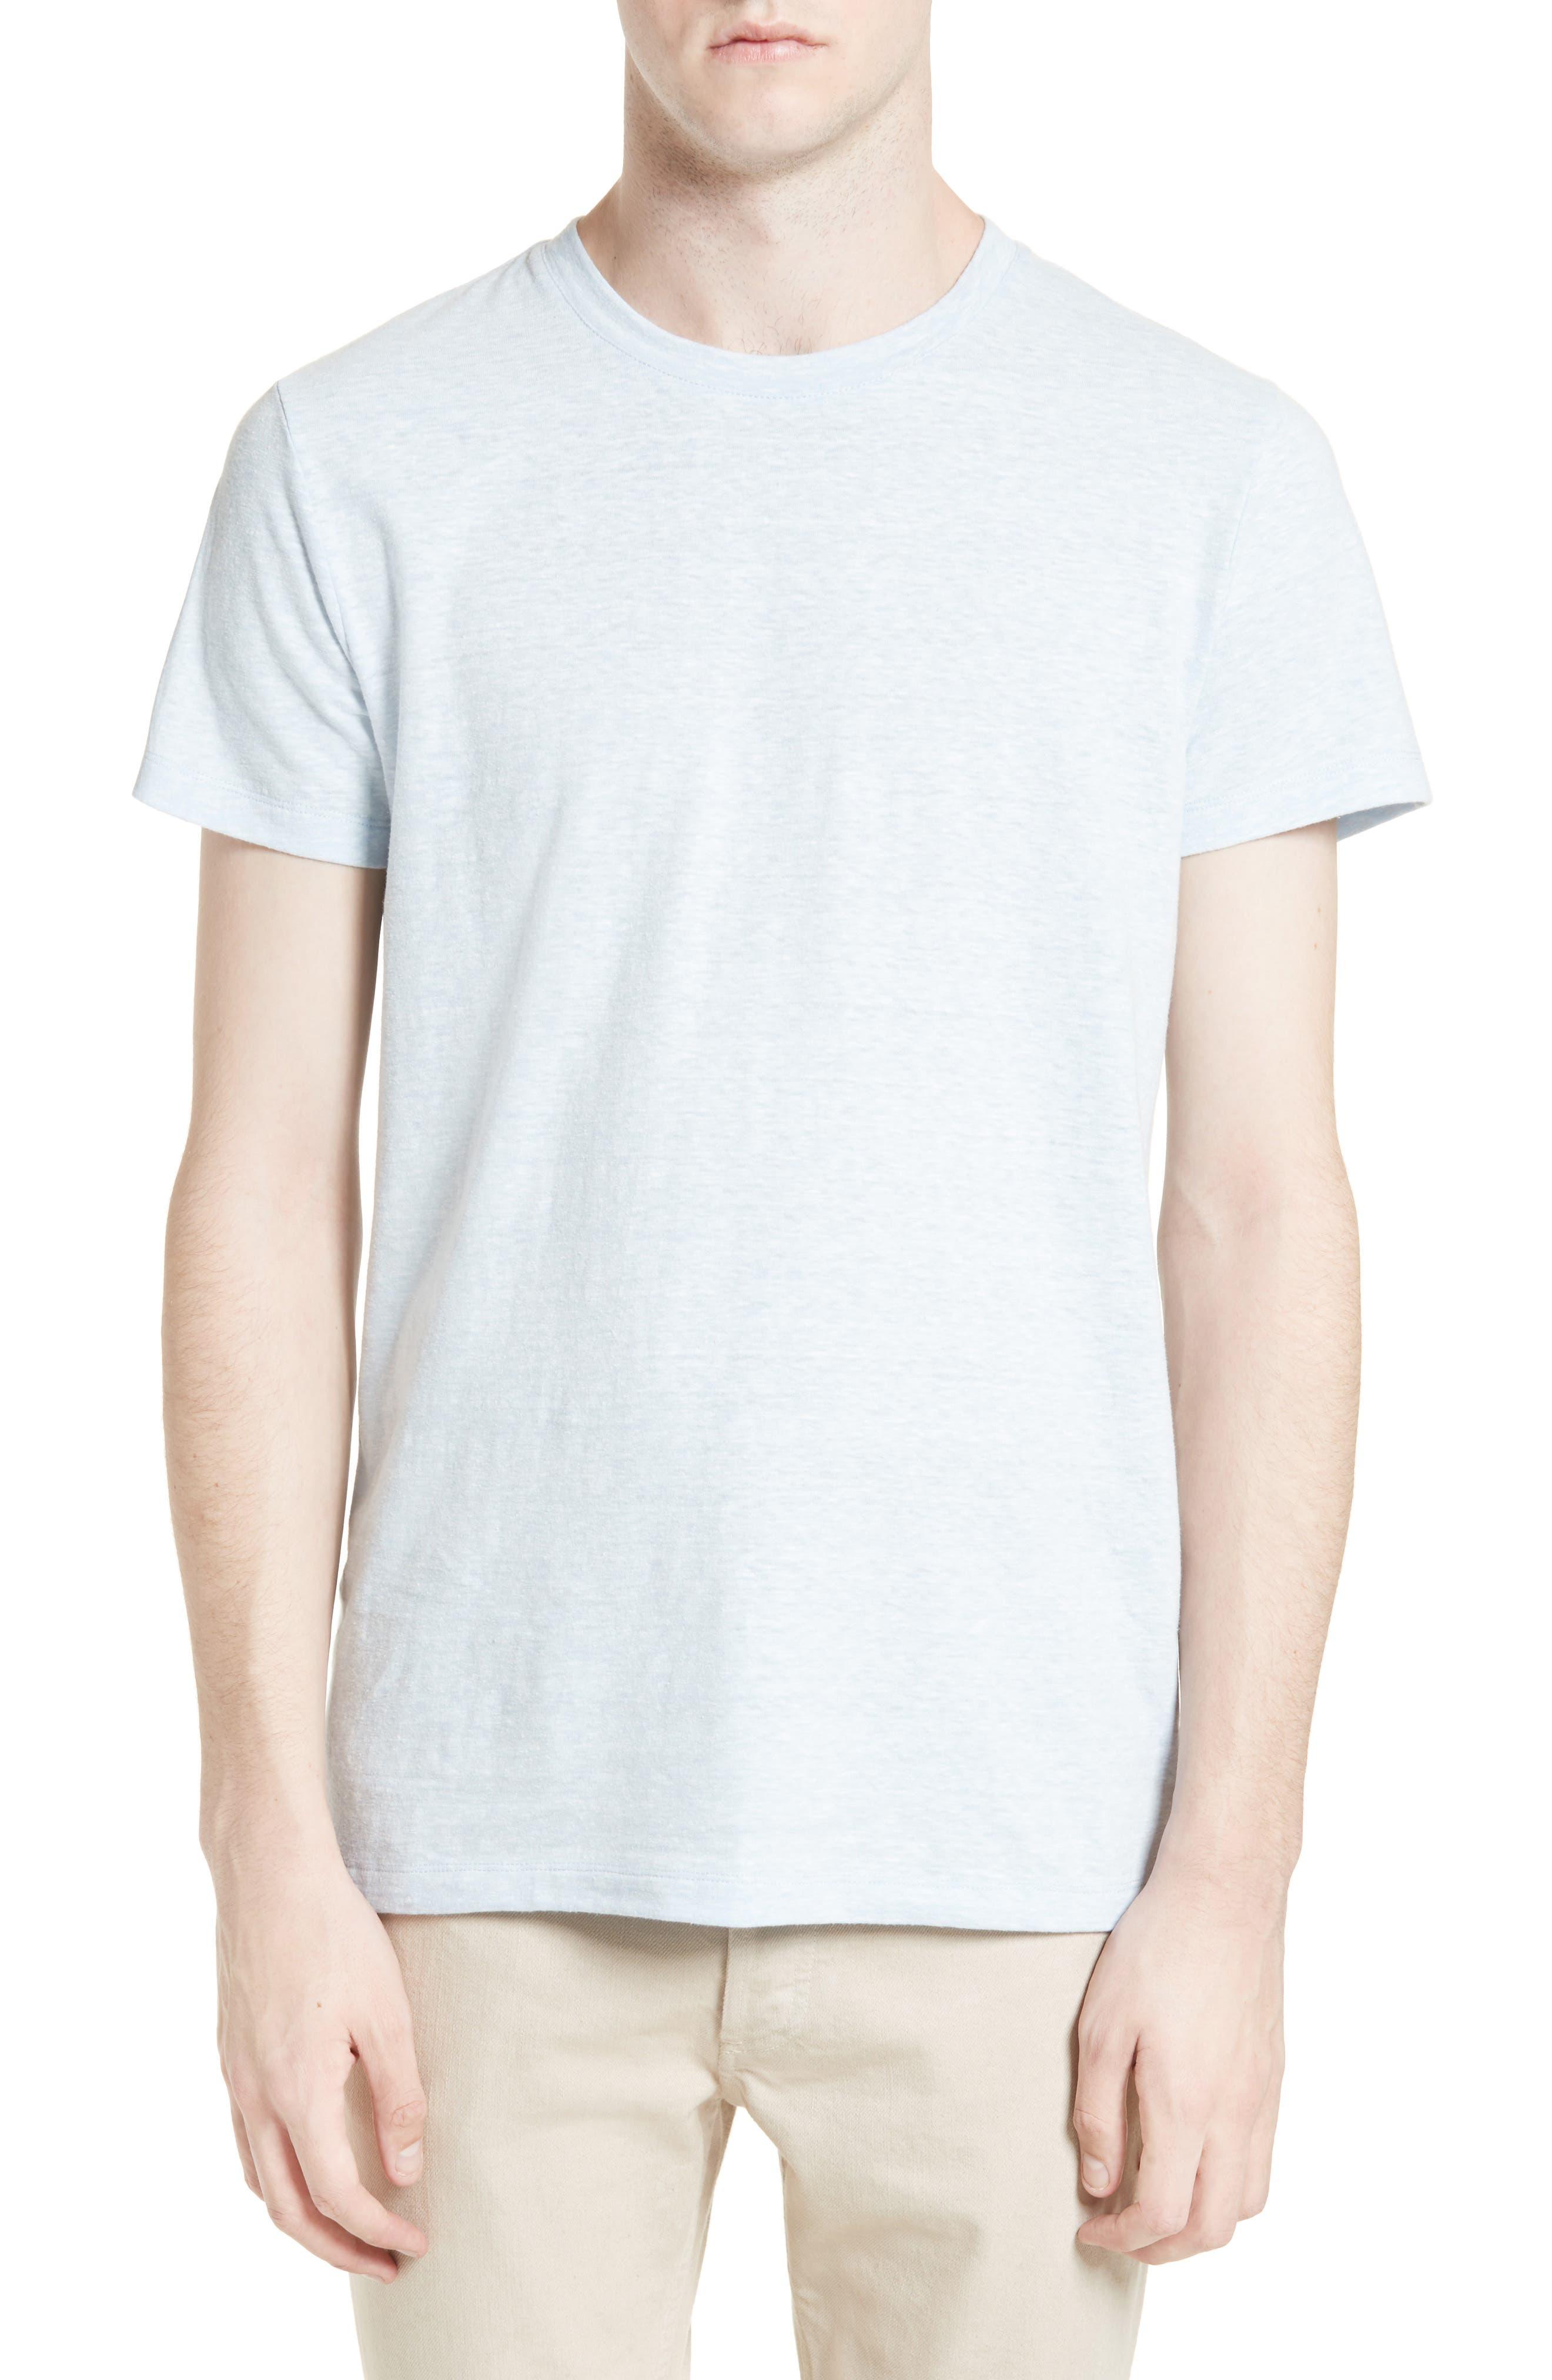 Jimmy T-Shirt,                             Main thumbnail 1, color,